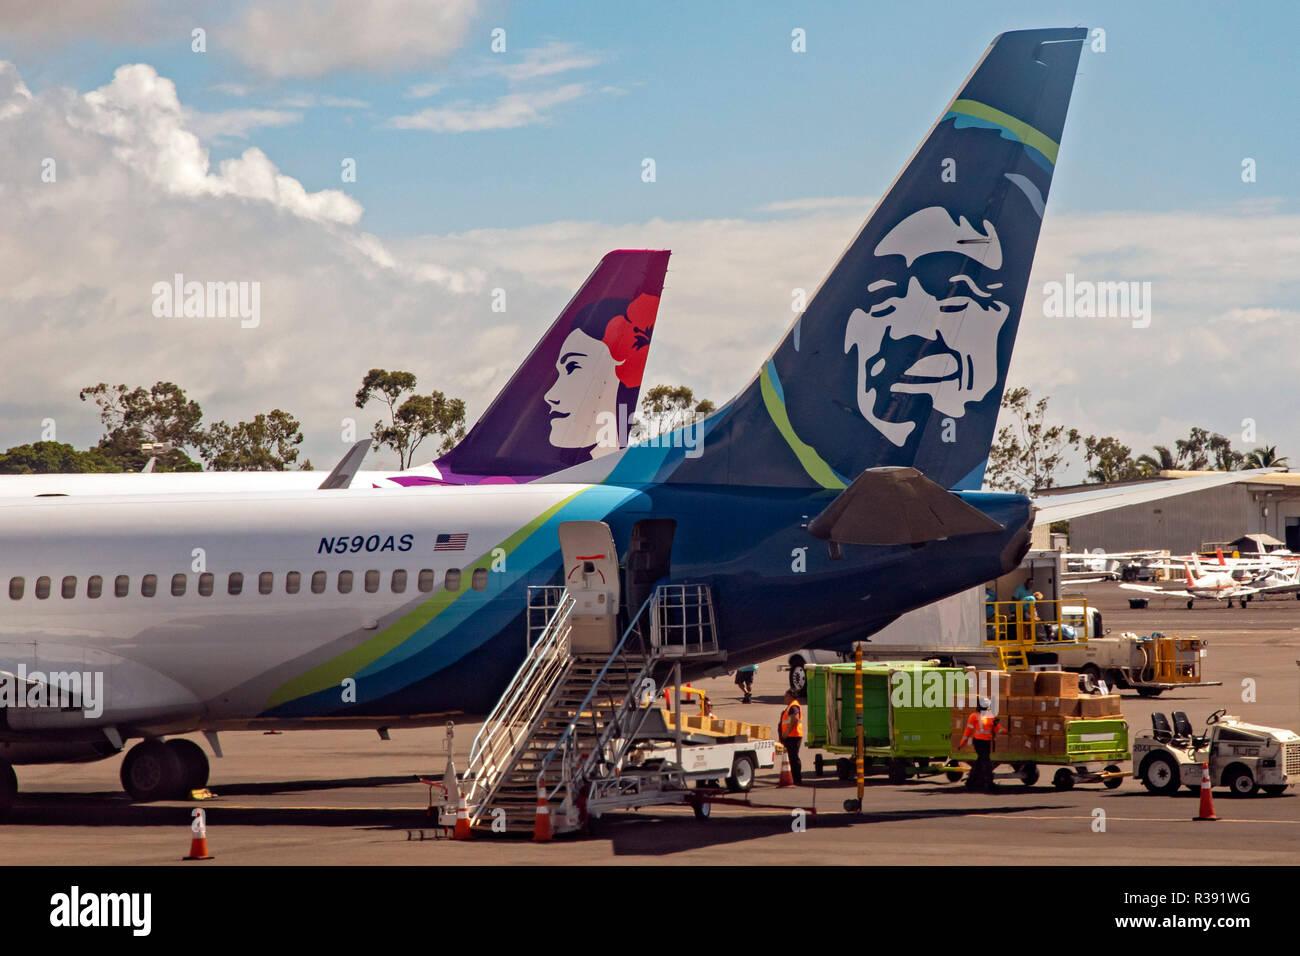 Kailua-Kona, Hawaii - Alaska Airlines et Hawaiian Airlines les avions à réaction à l'aéroport international de Kona sur Hawaii's Big Island. Banque D'Images